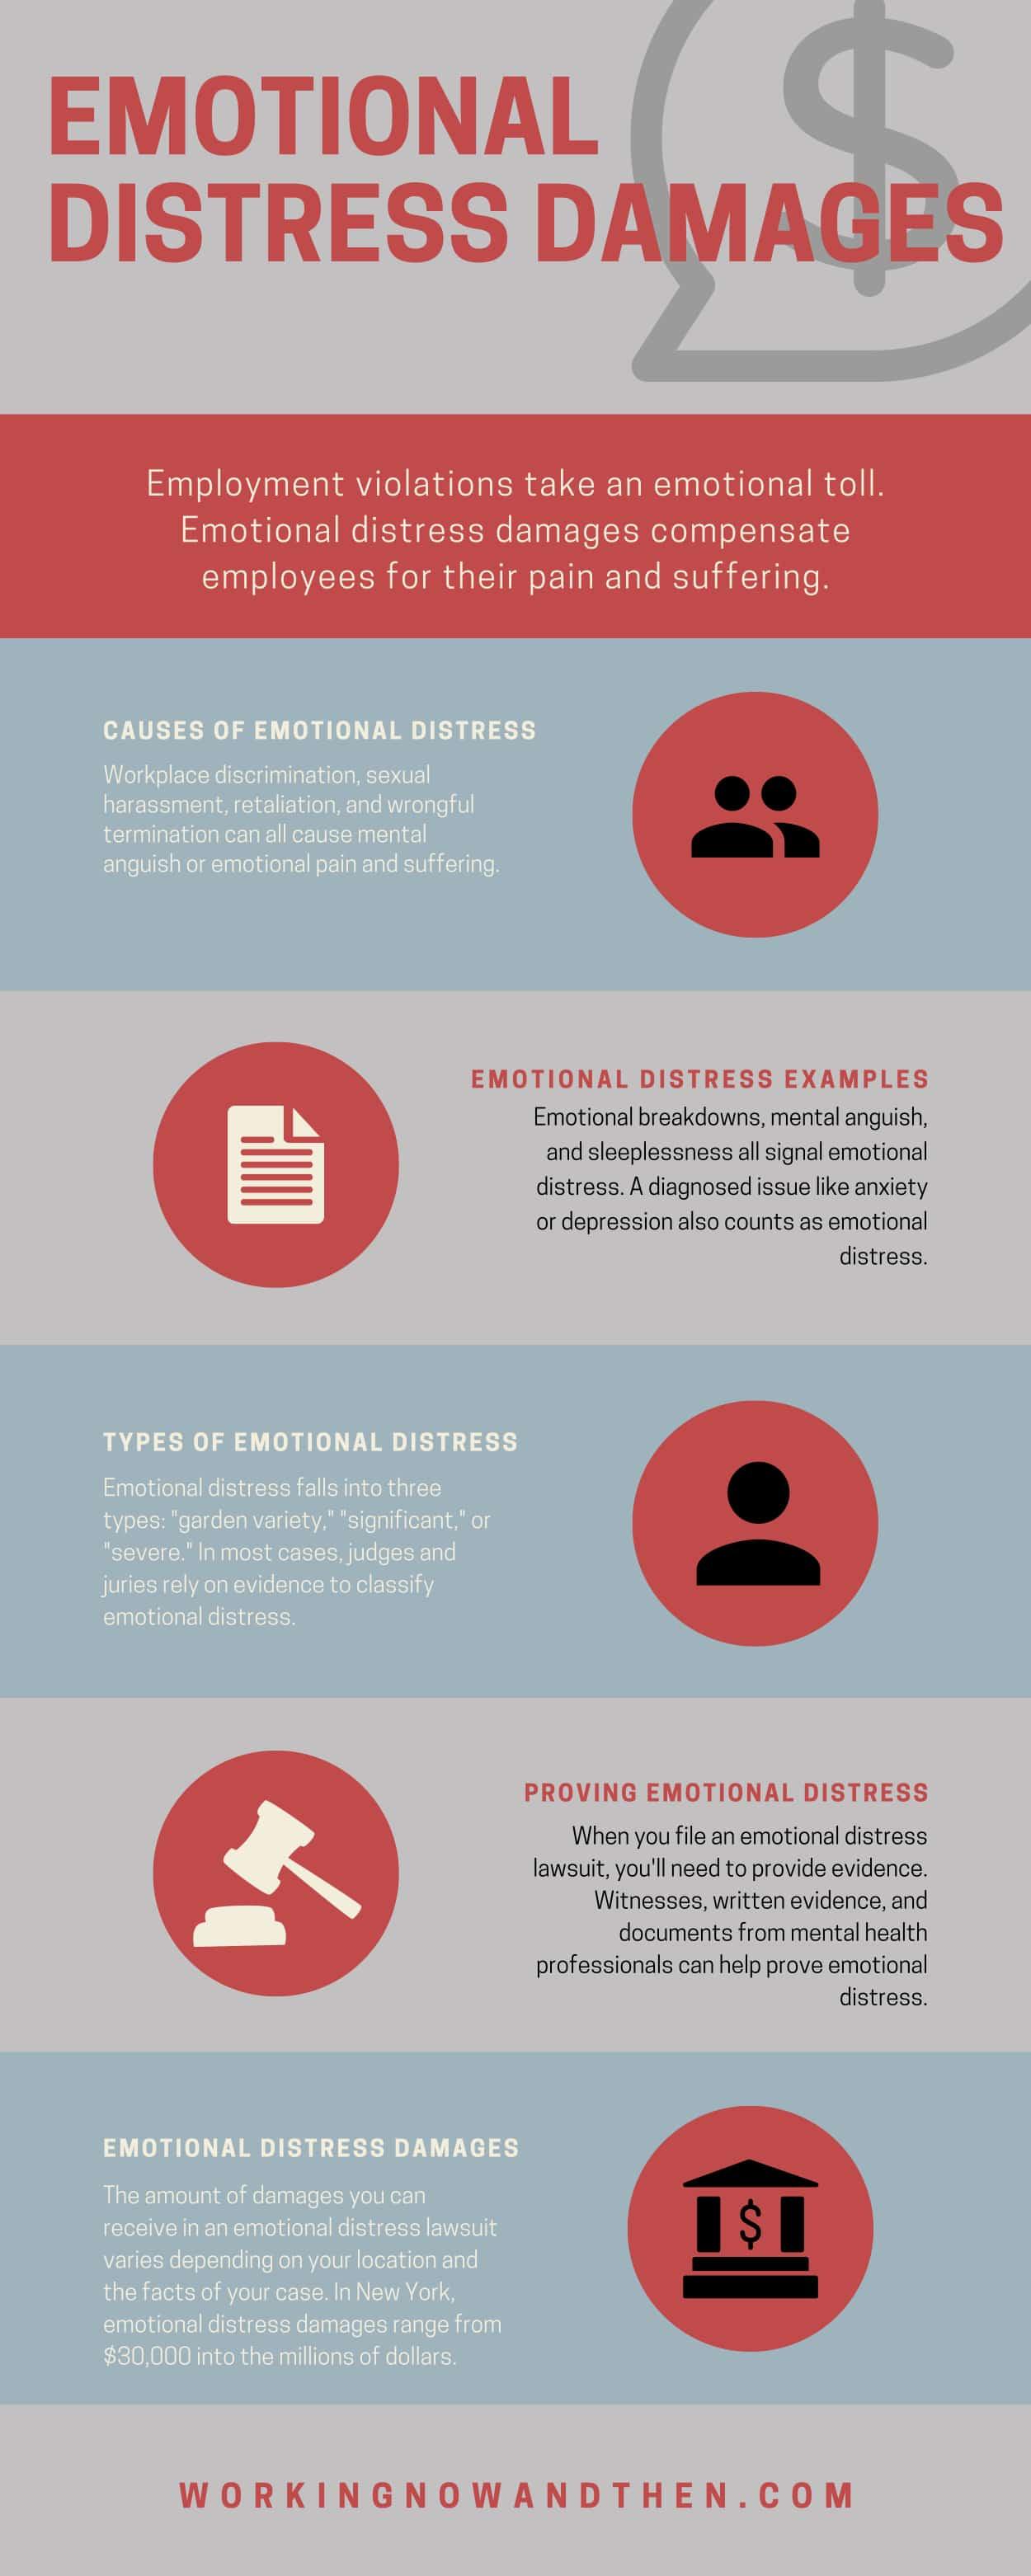 Emotional distress damages infographic